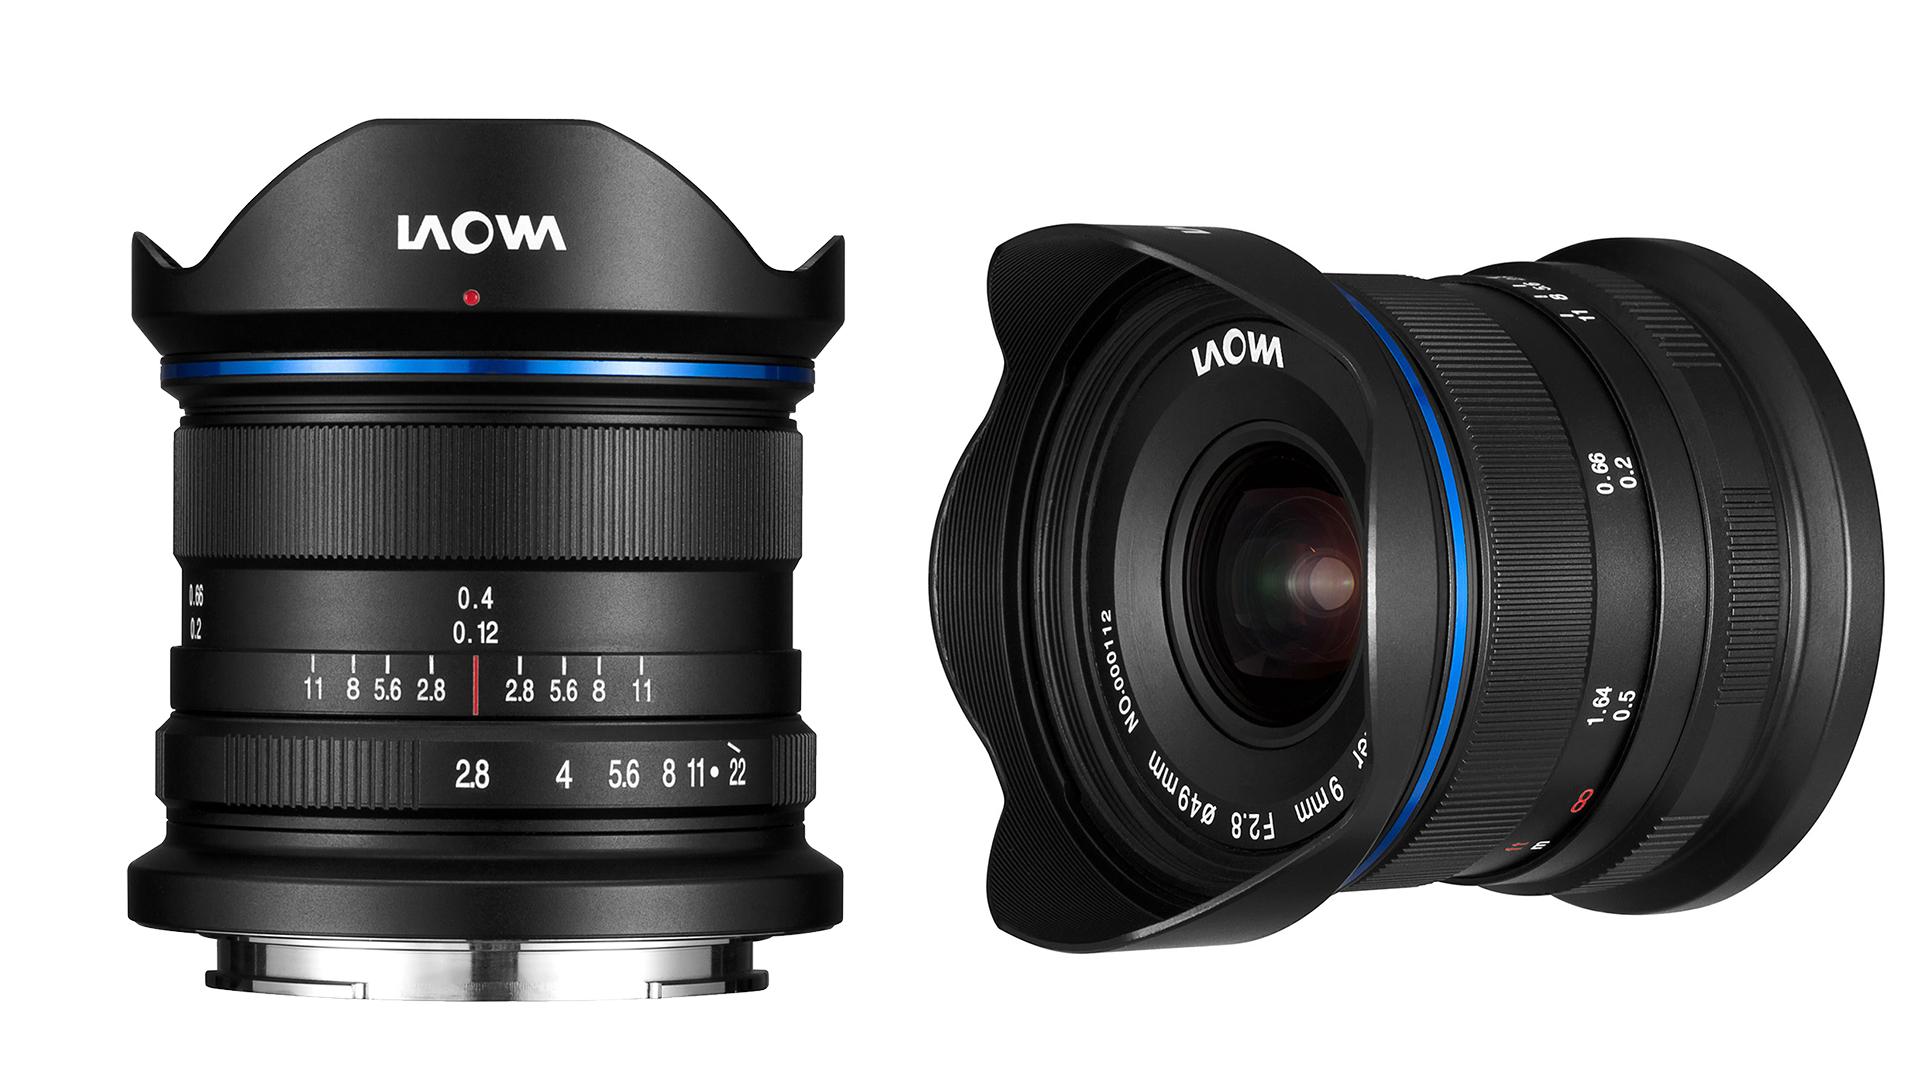 Laowa 9mm Lens